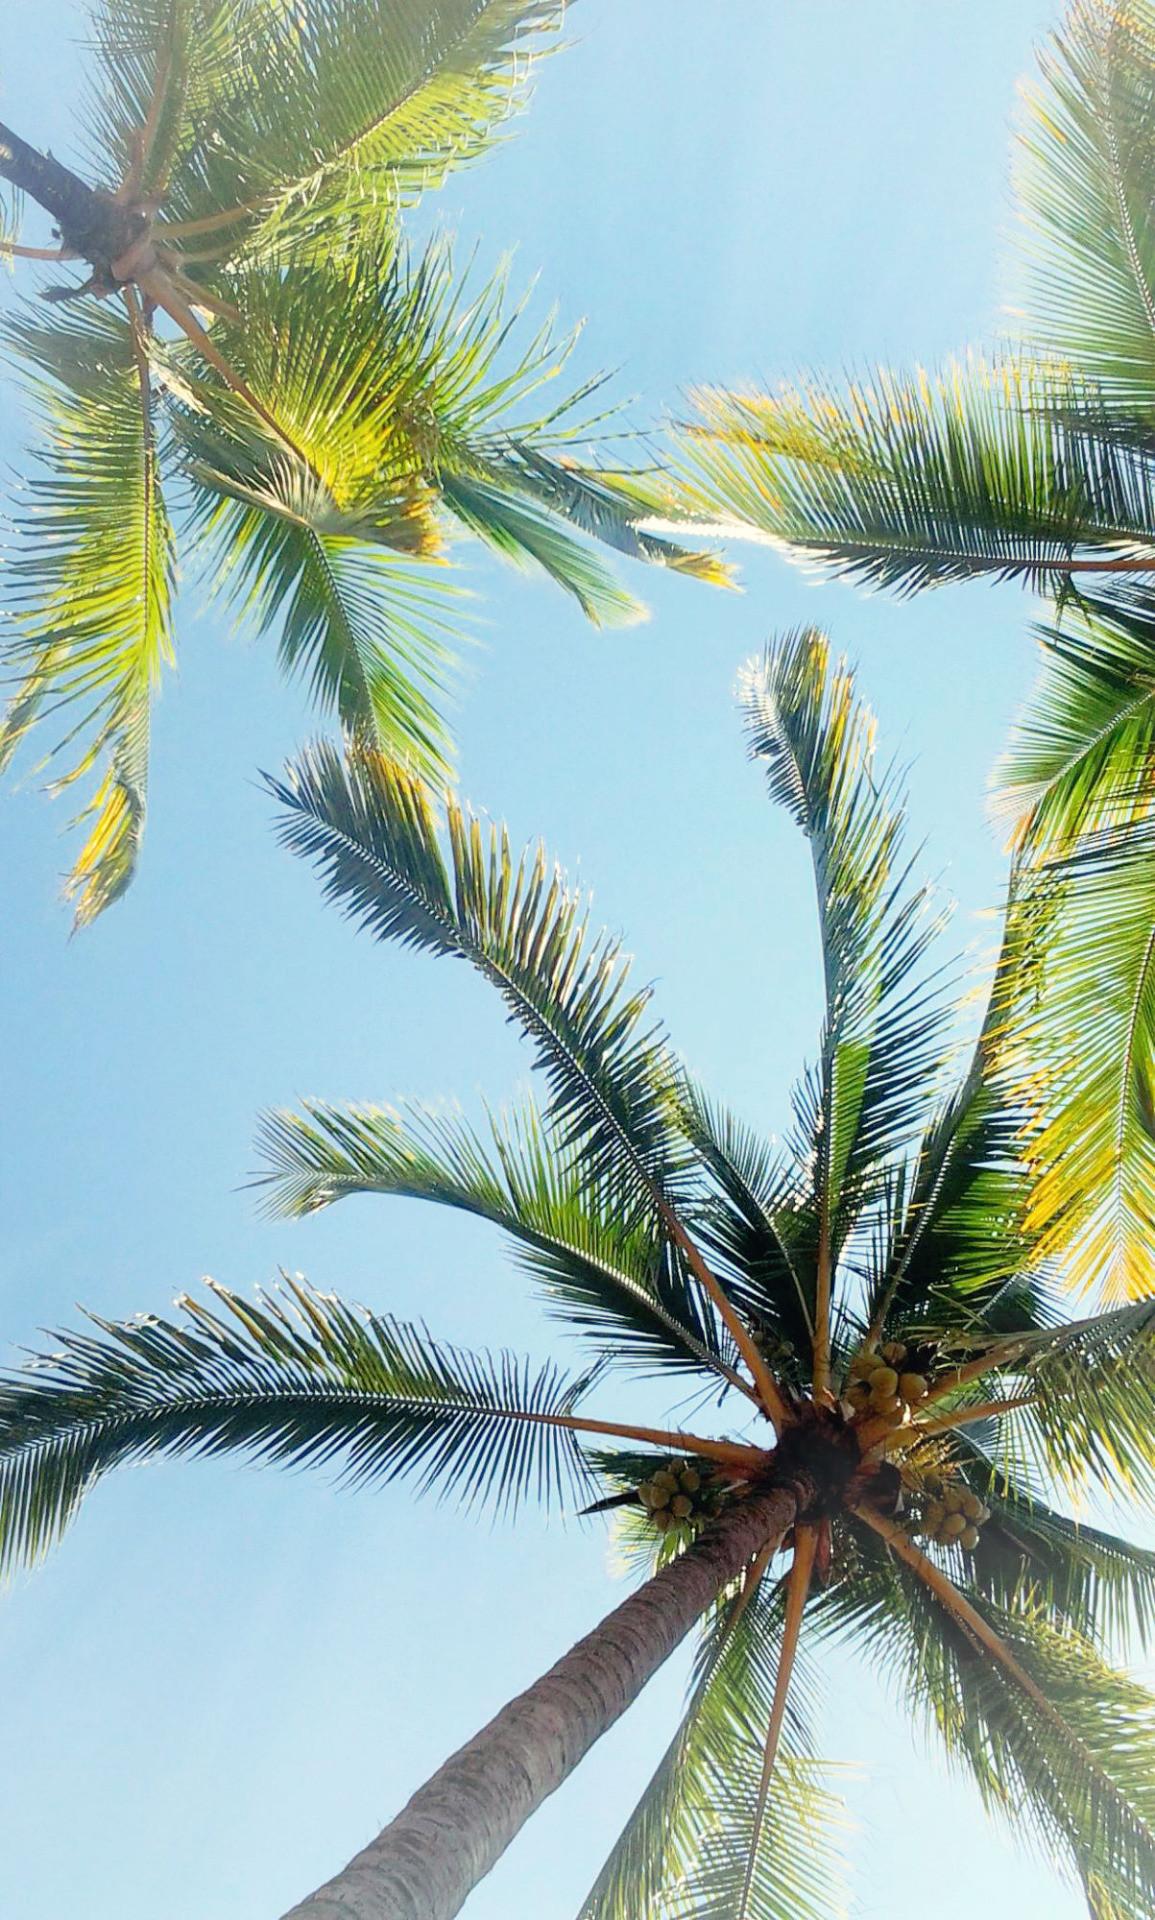 Palm Tree Iphone   Data-src - Iphone Wallpaper Palm Trees - HD Wallpaper